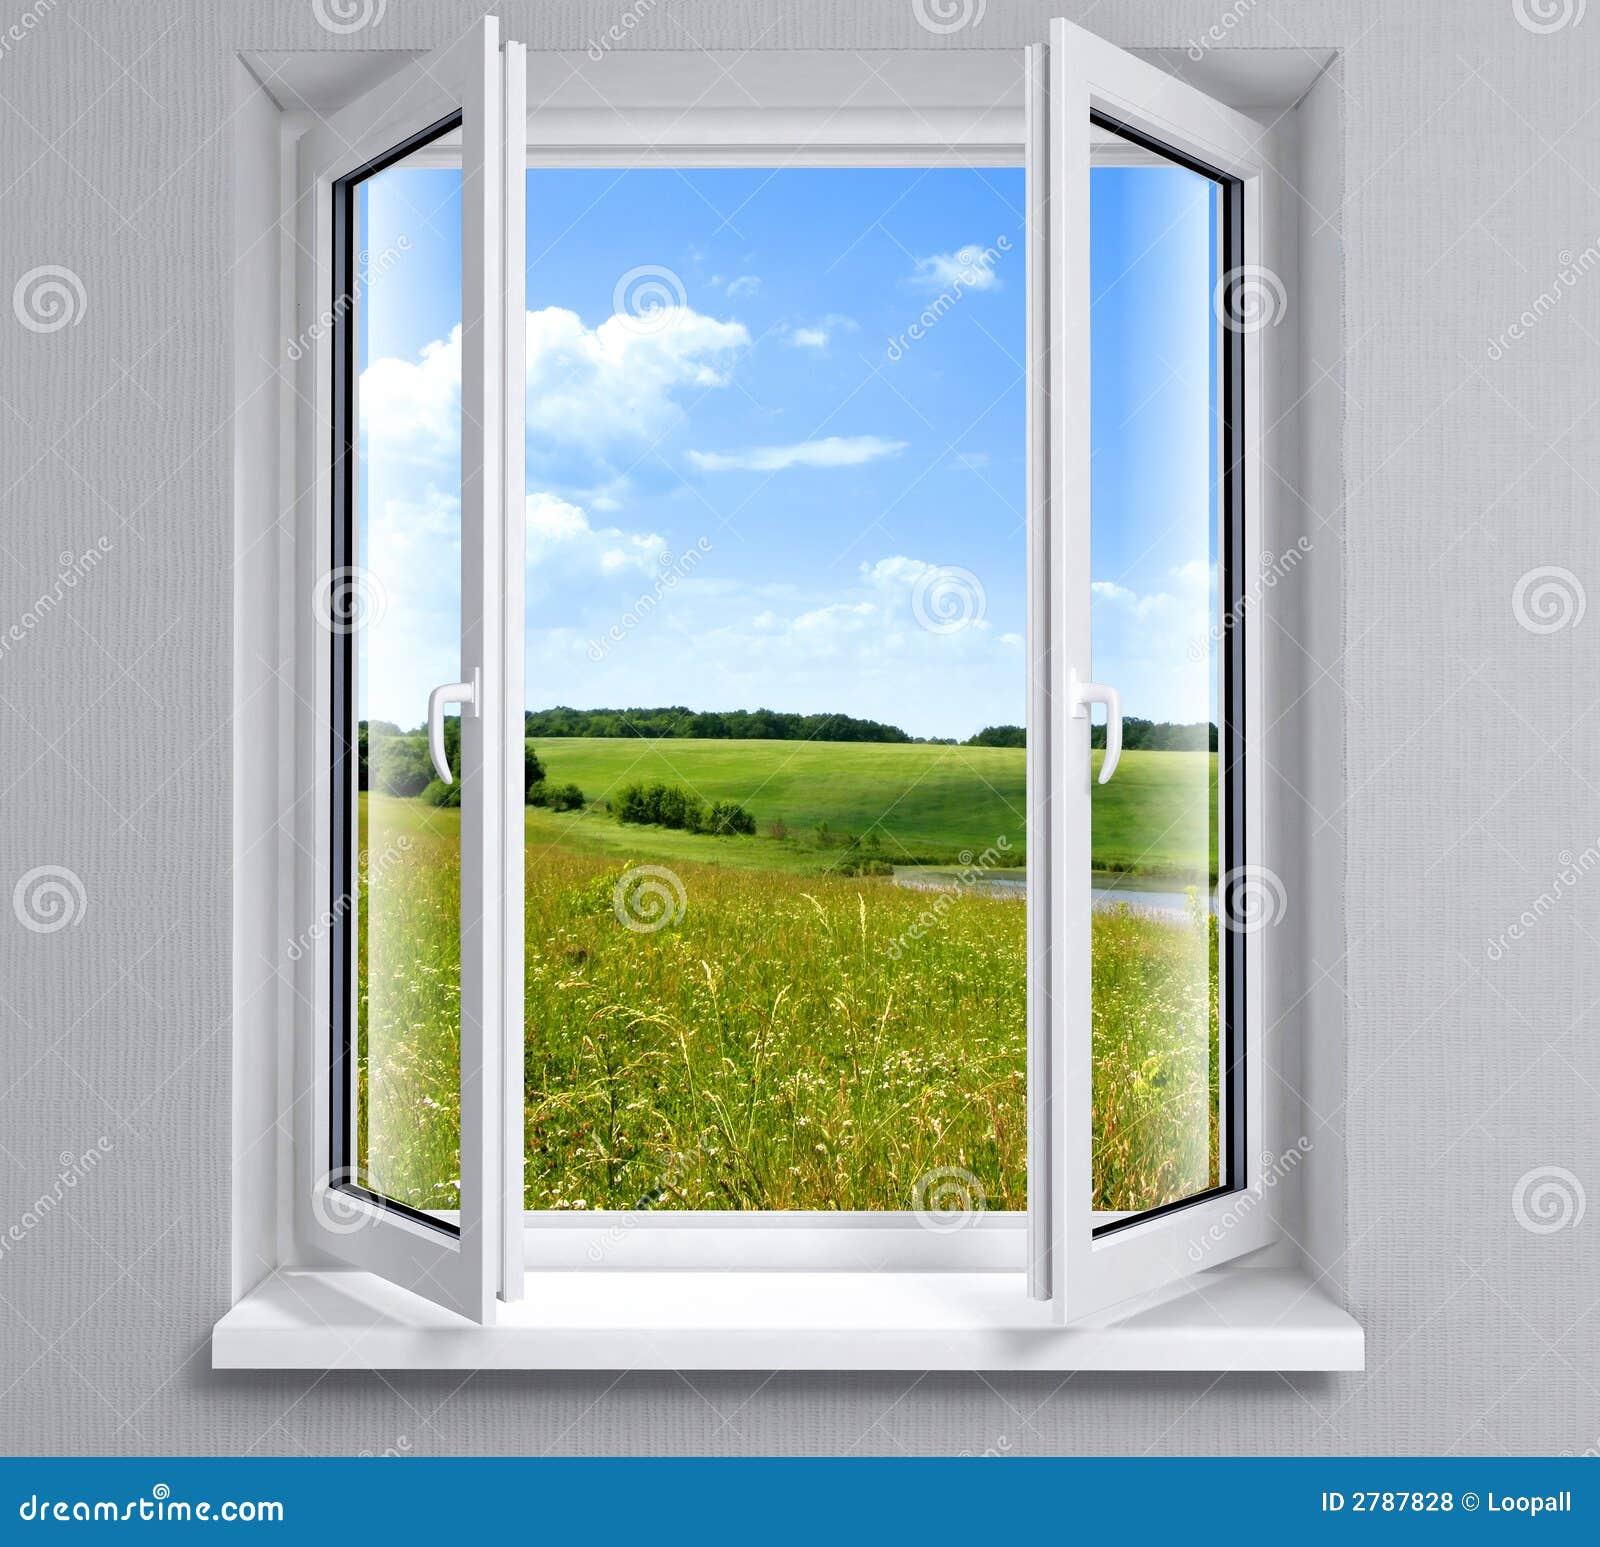 opened window stock photo image of element glass image 2787952